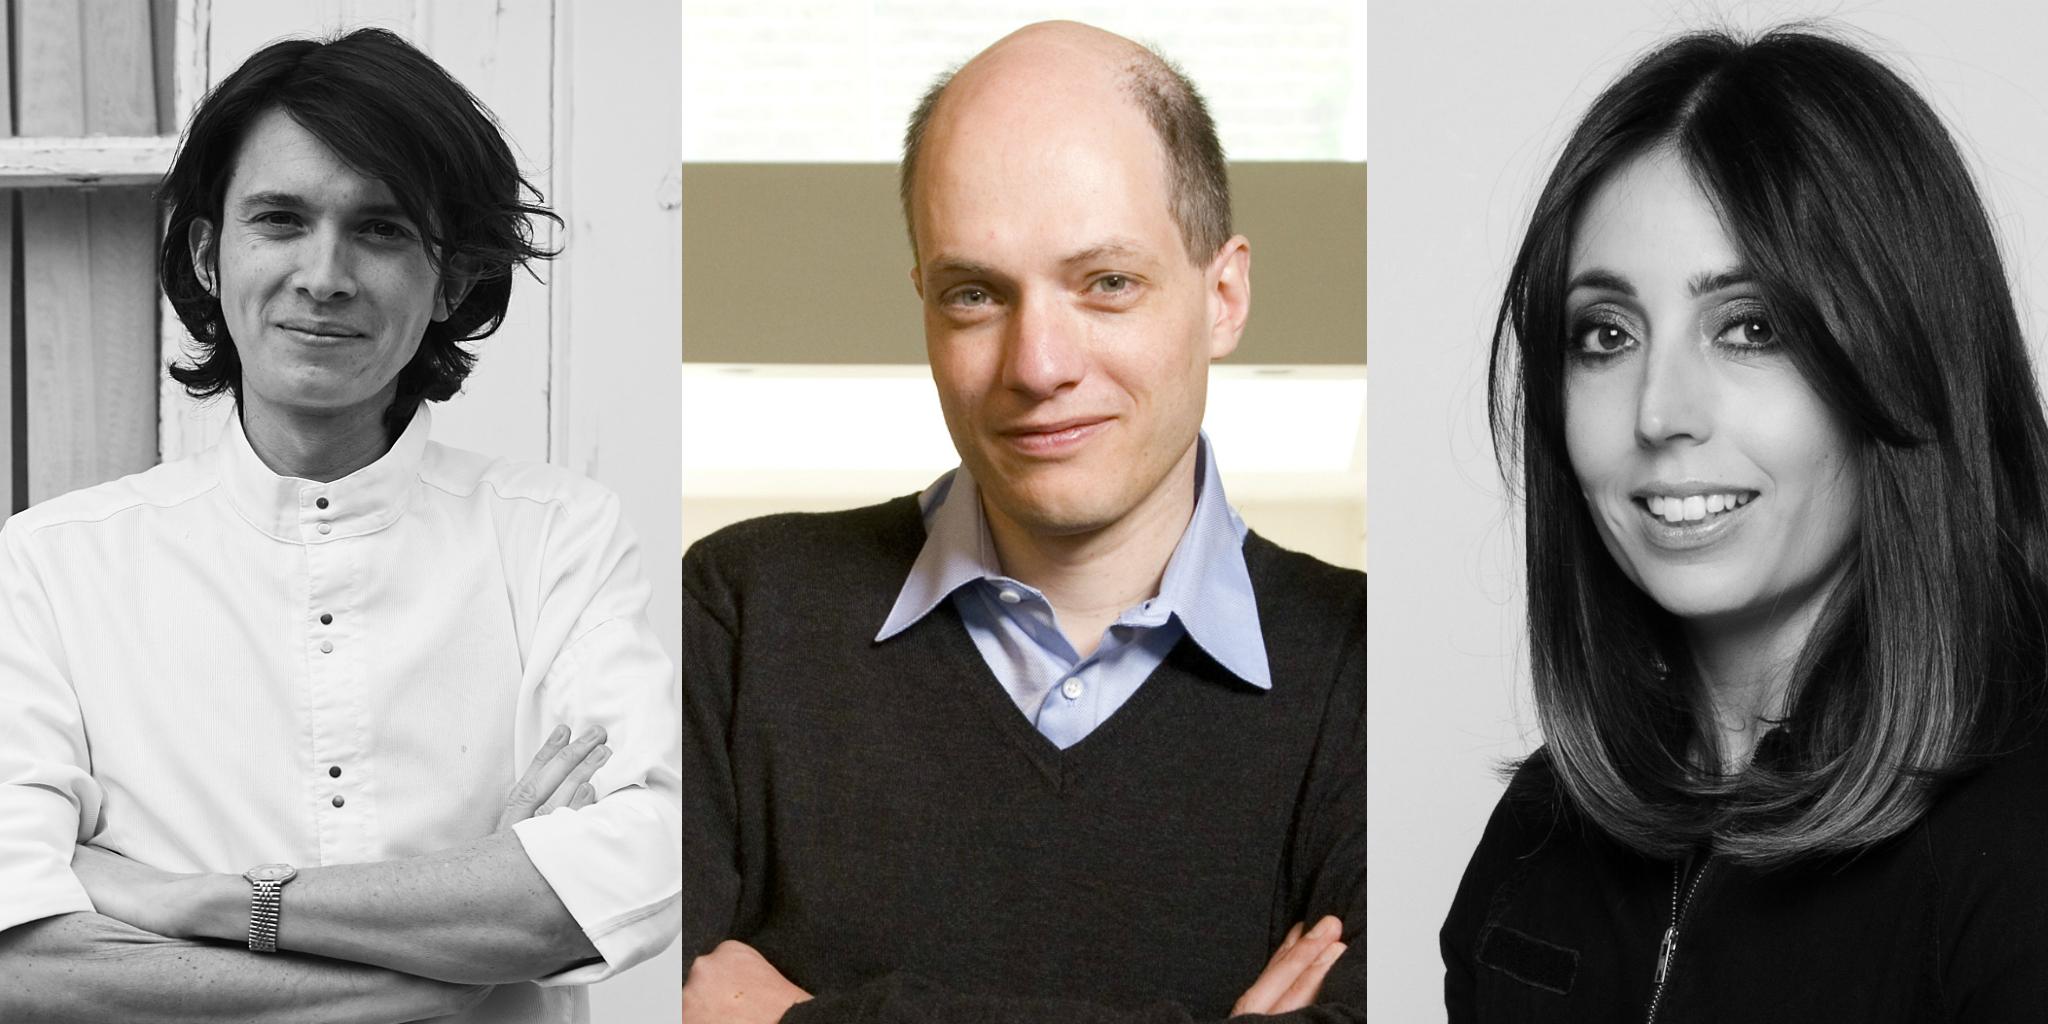 Charles Michel, Alain de Botton, and Emma Sexton